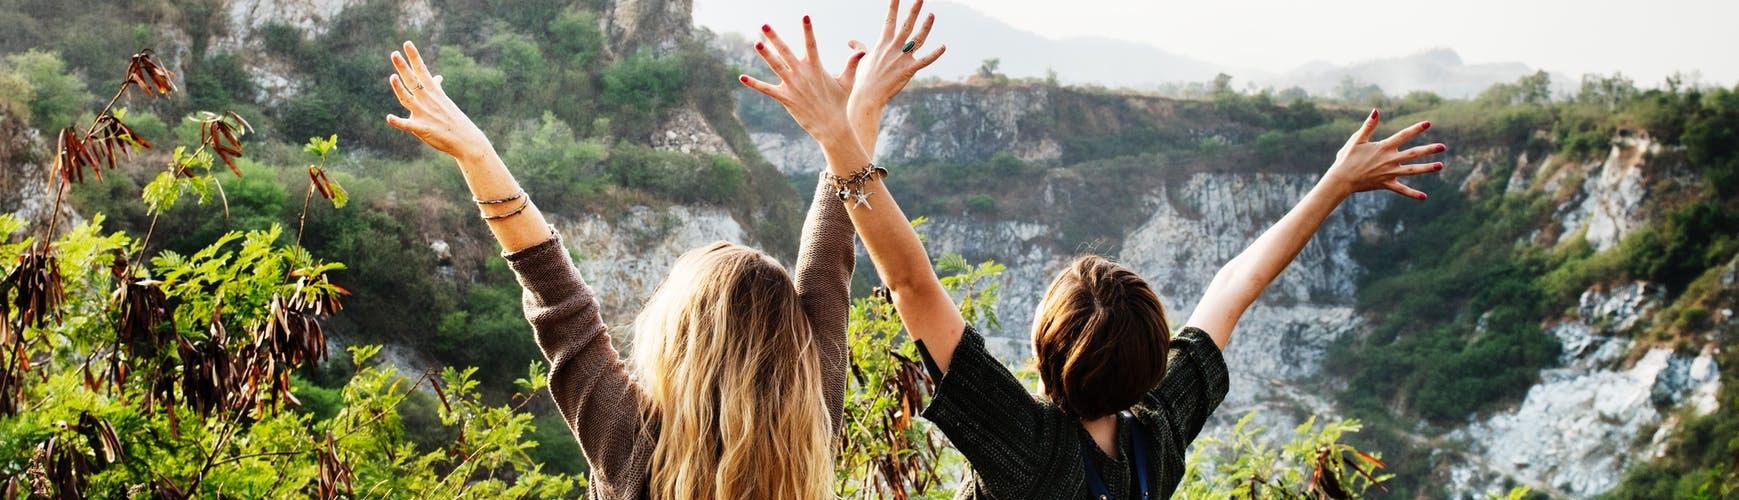 How to Celebrate Women's Health Week